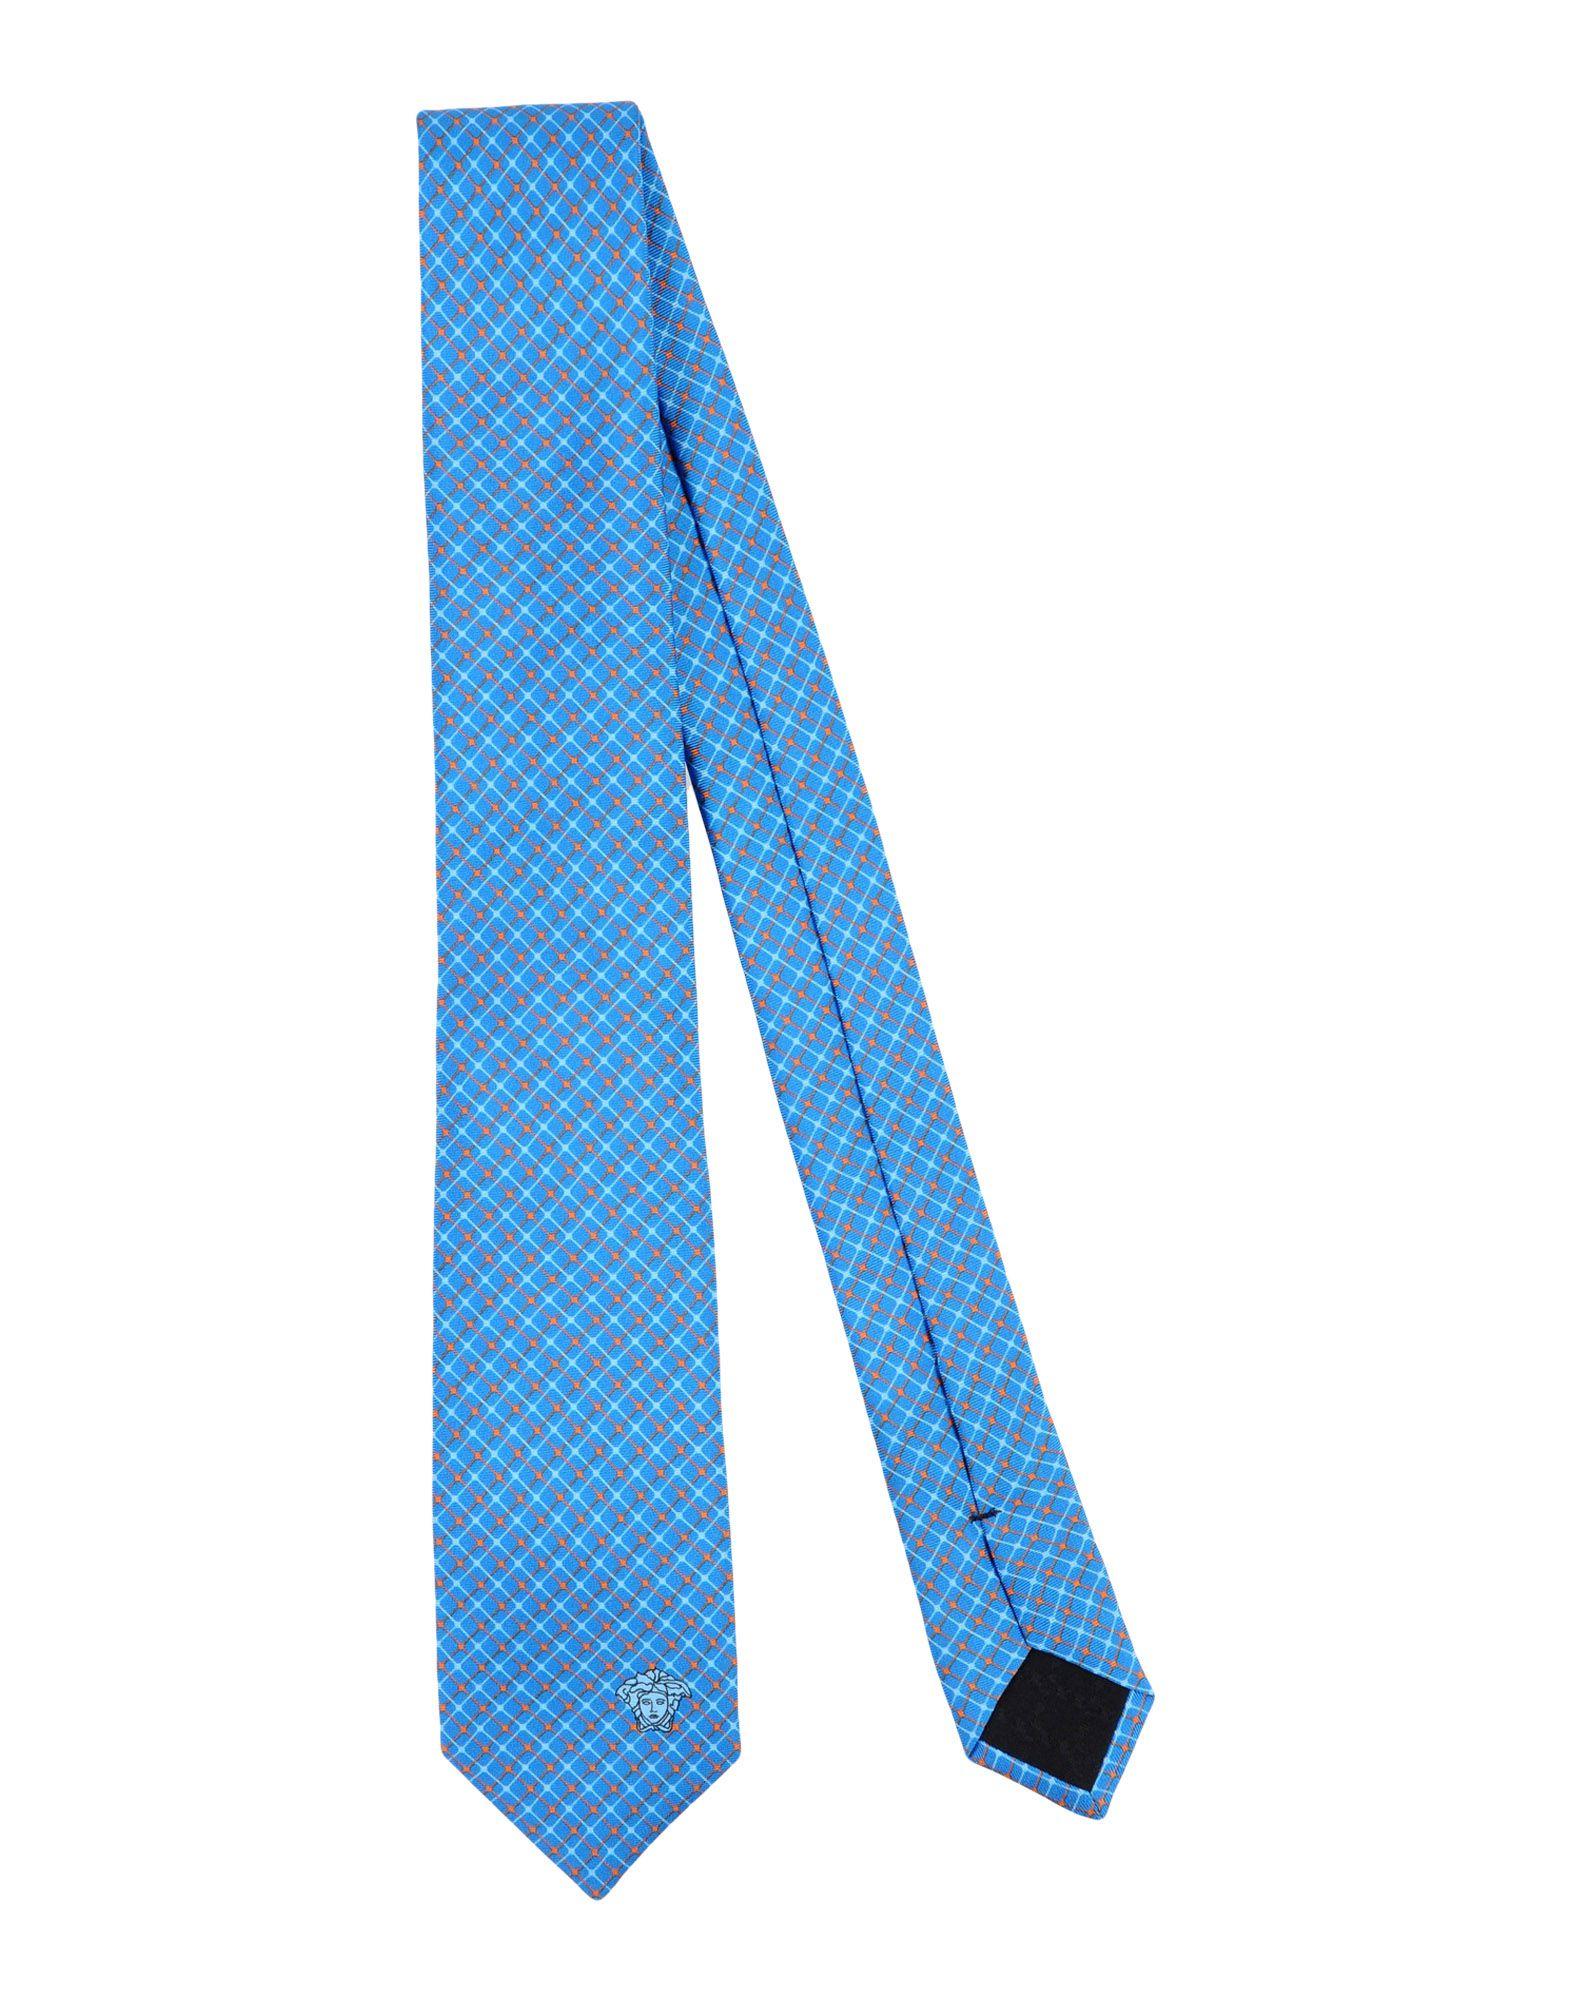 VERSACE Галстук versace бордовый галстук в клетку внизу с логотипом versace 821752